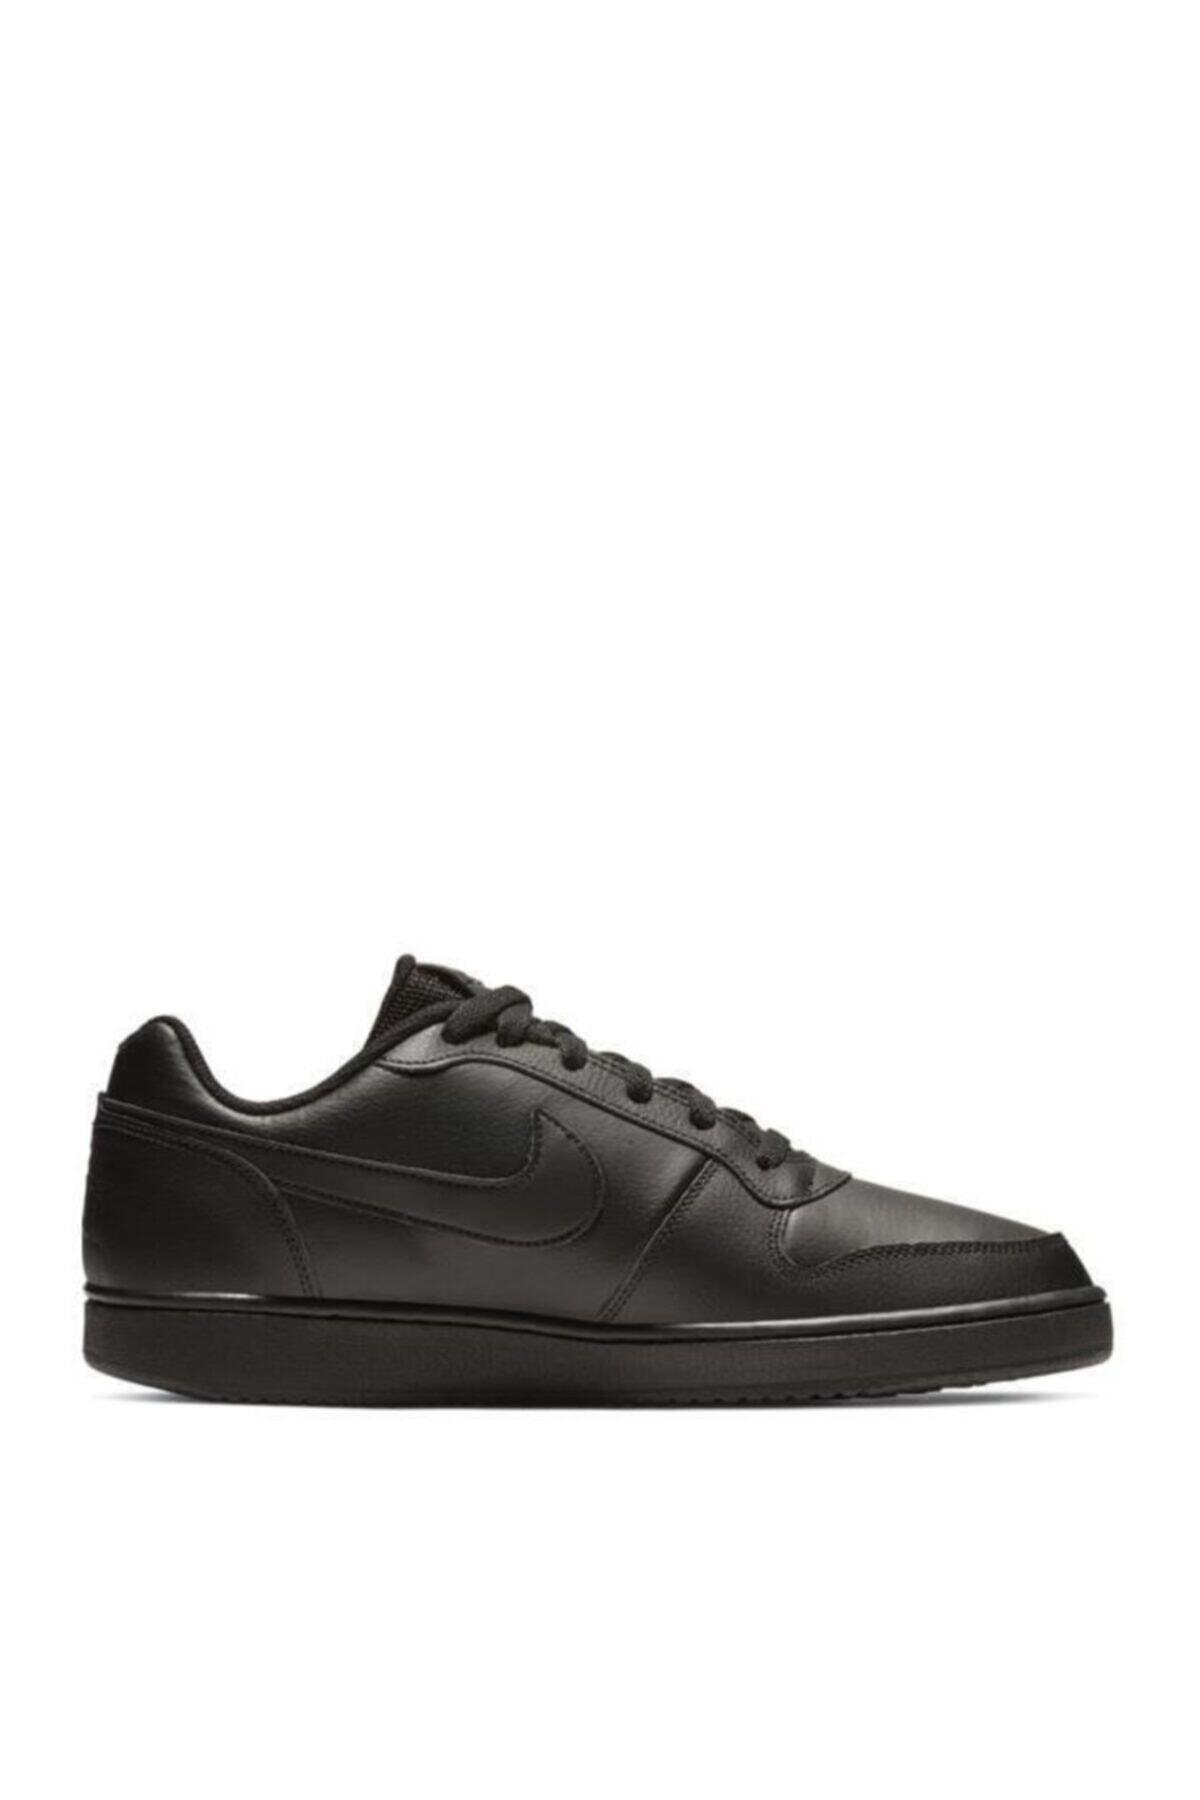 Nike Erkek Siyah Spor Ayakkabı Aq1775-003 1